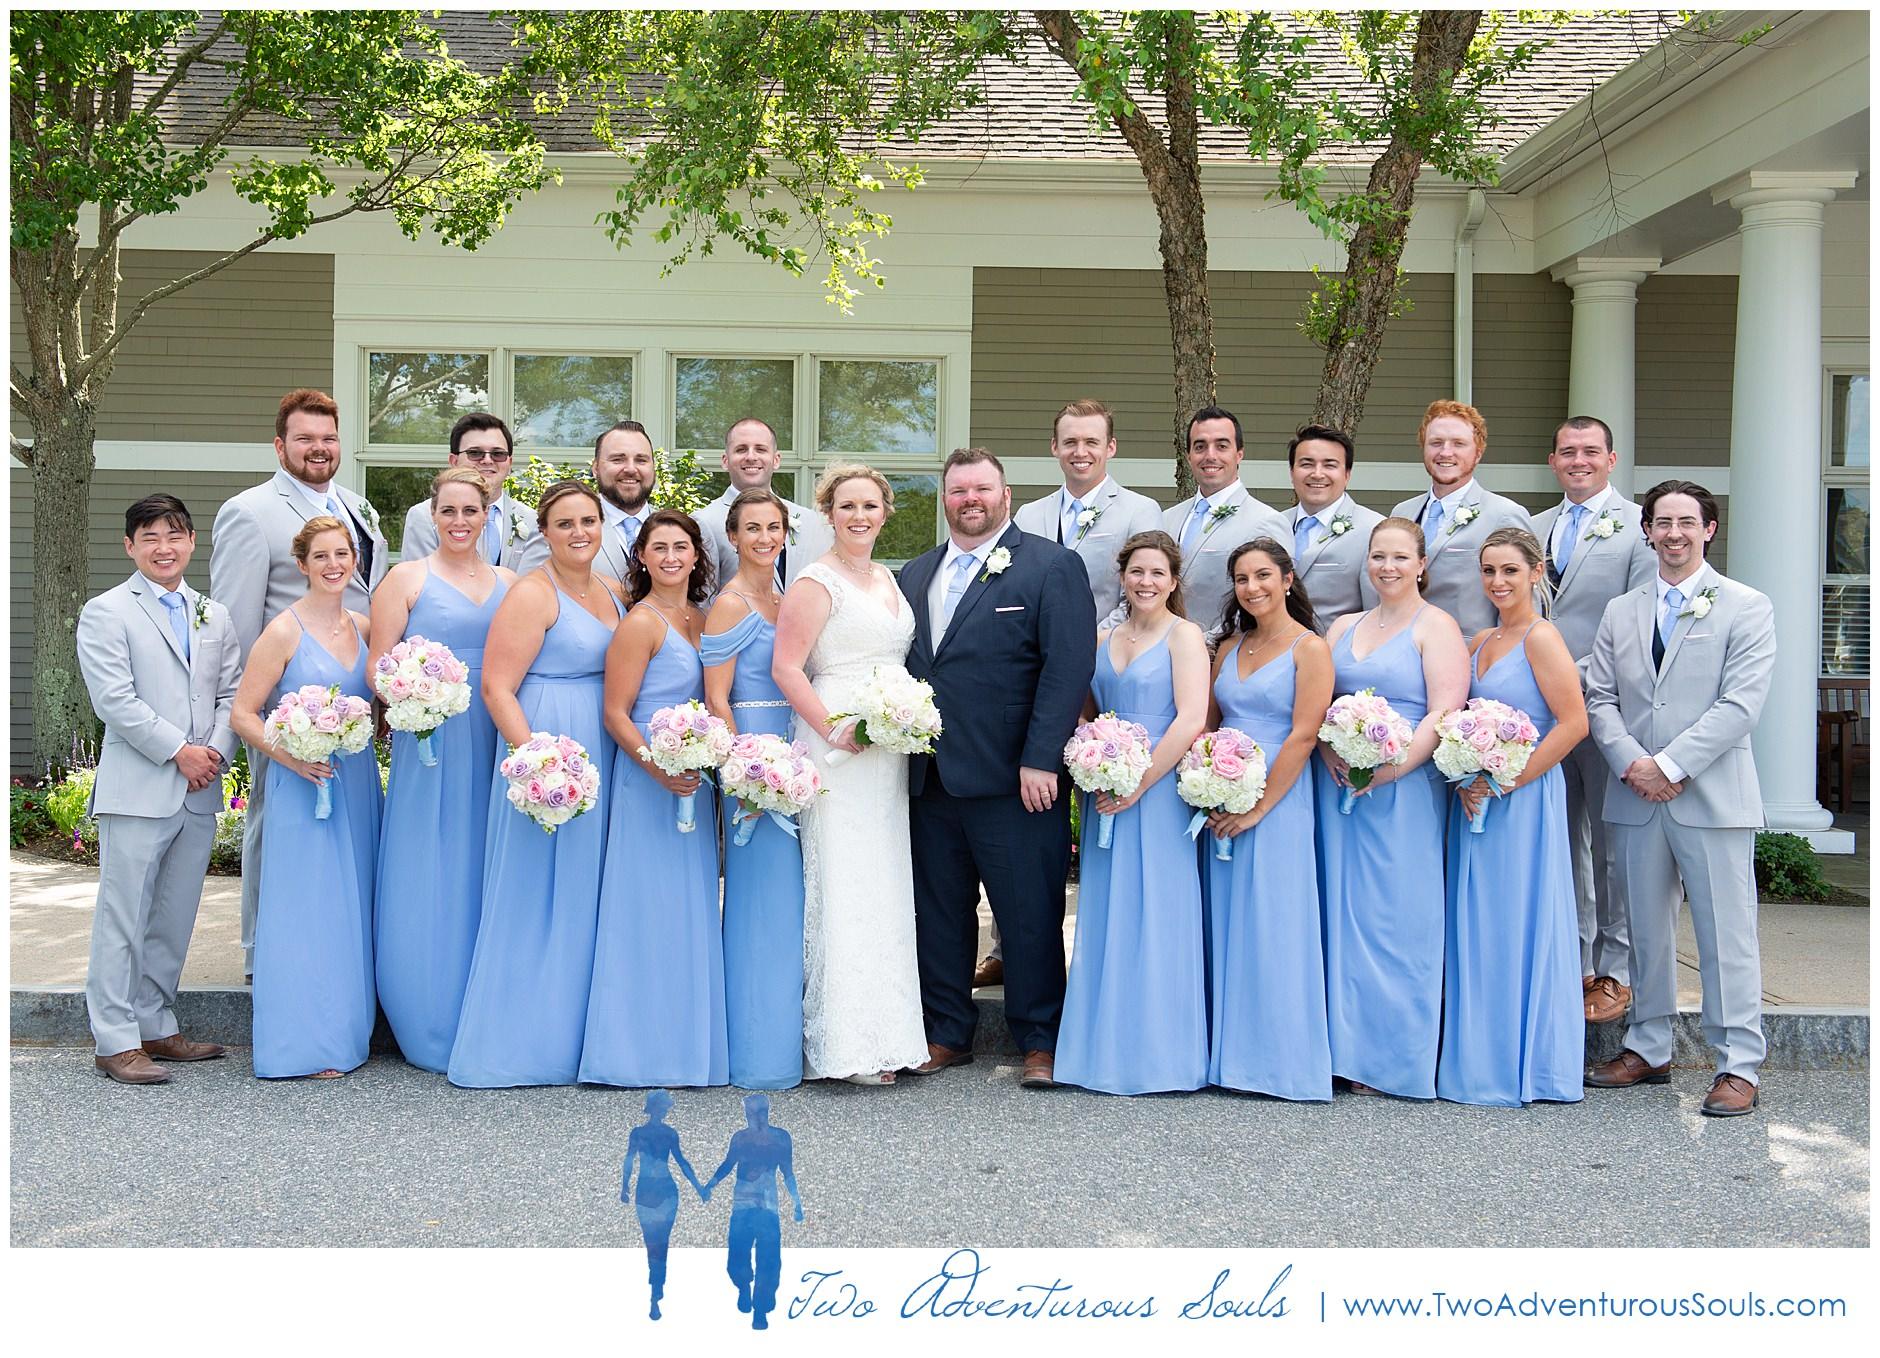 Cape Cod Wedding Photographers, Destination Wedding Photographers, Two Adventurous Souls-081019_0030.jpg